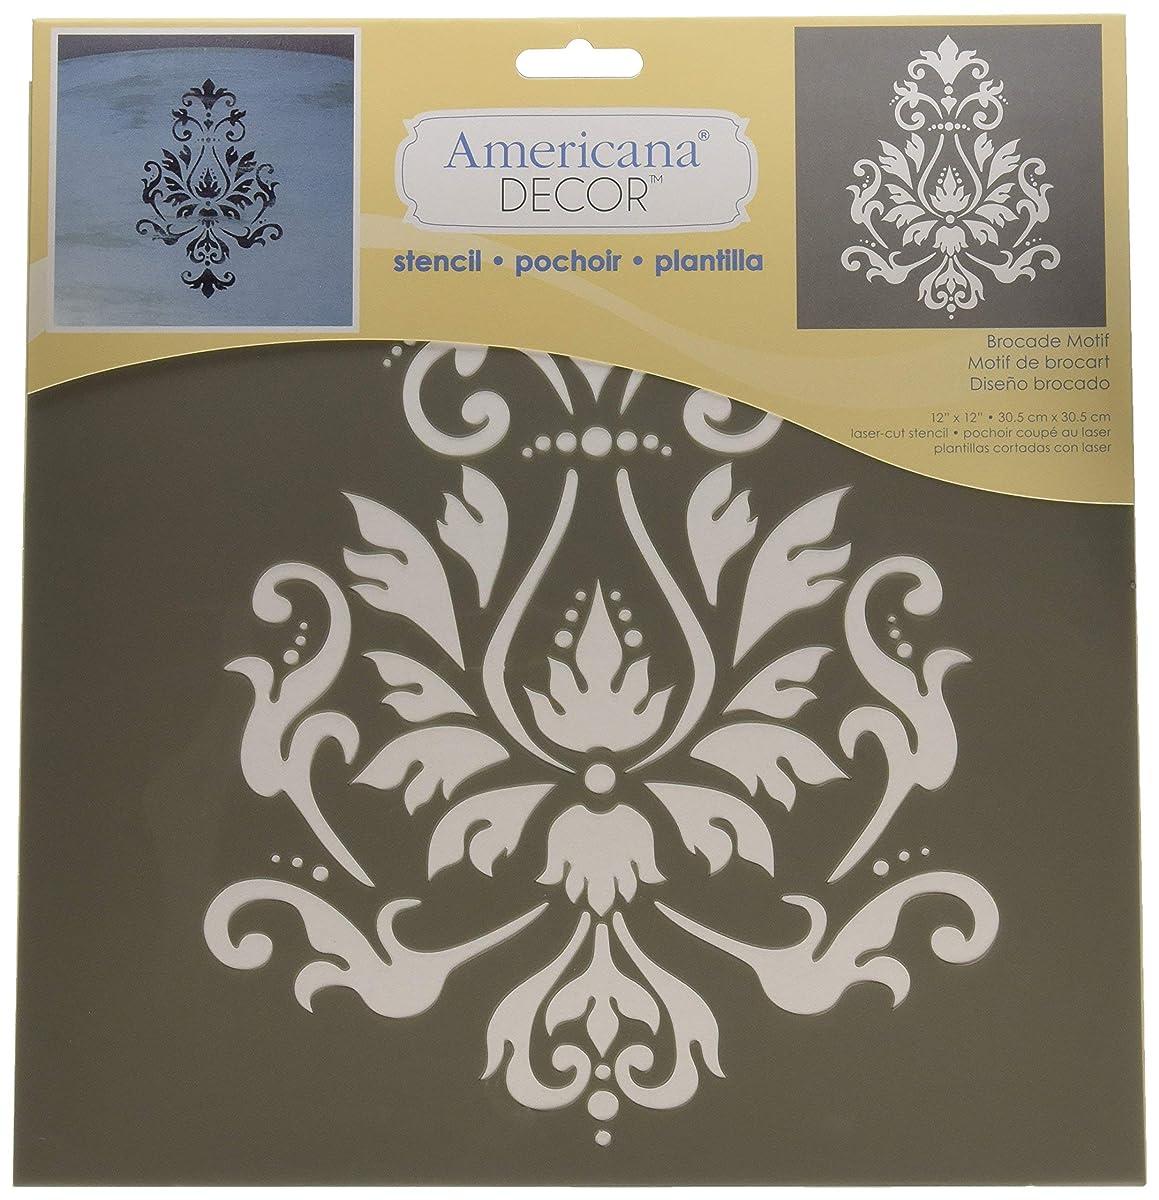 DecoArt ADS-01 Americana Decor Stencil, Brocade Motif